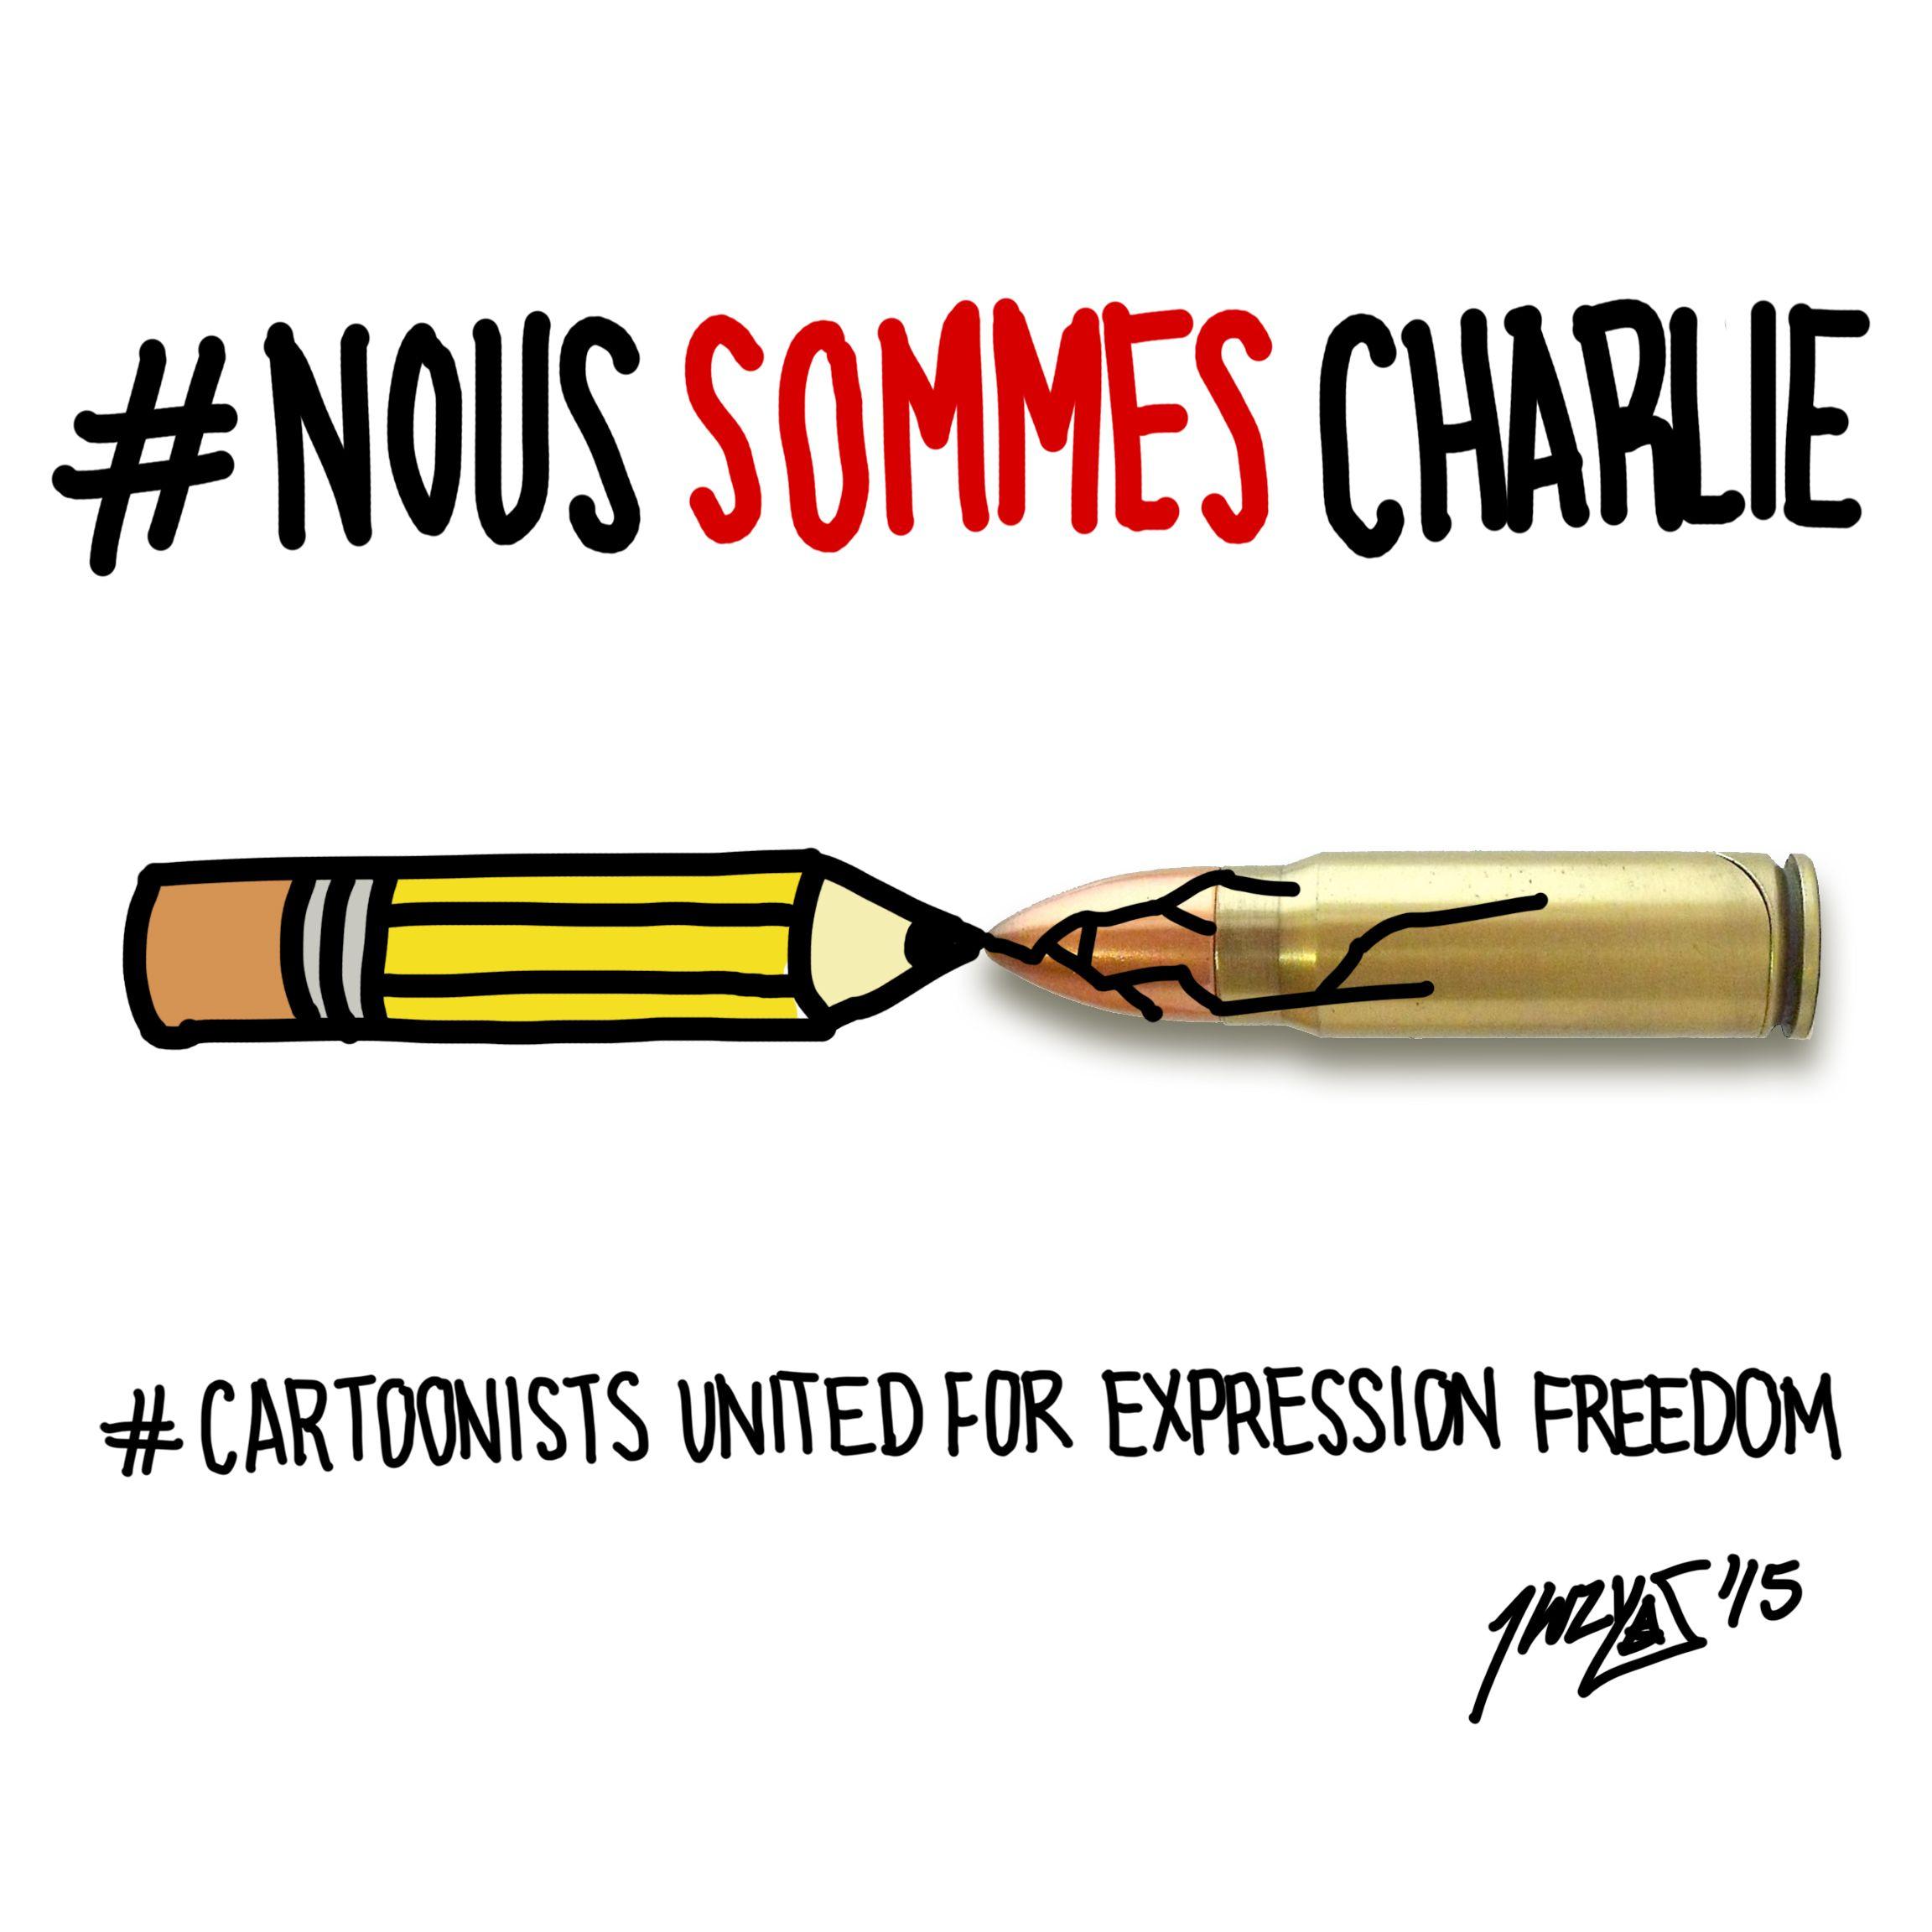 #NousSommesCharlie #CartoonistsUnitedForExpressionFreedom